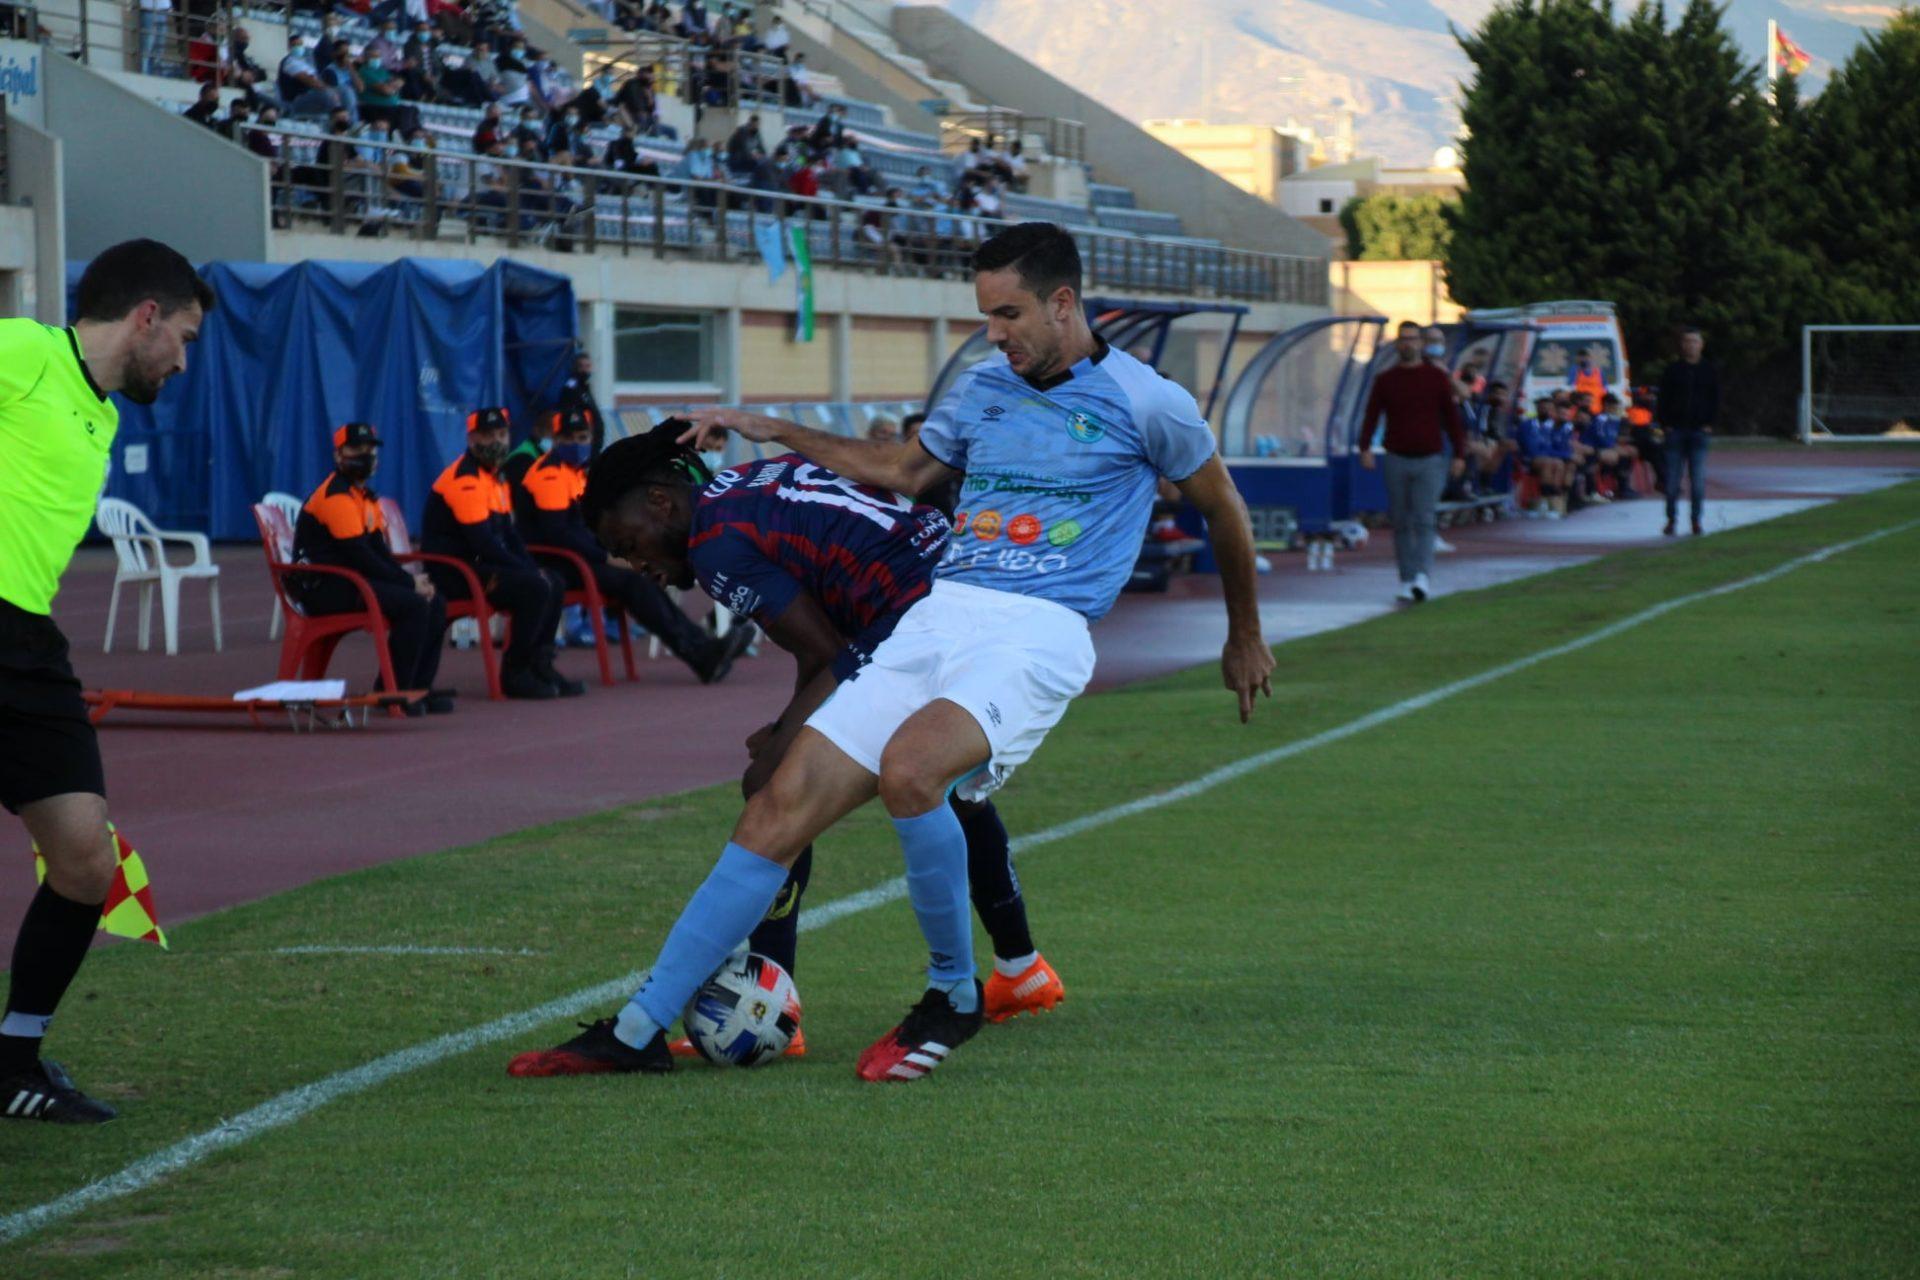 CD El Ejido 2012 vs Yeclano Deportivo 13